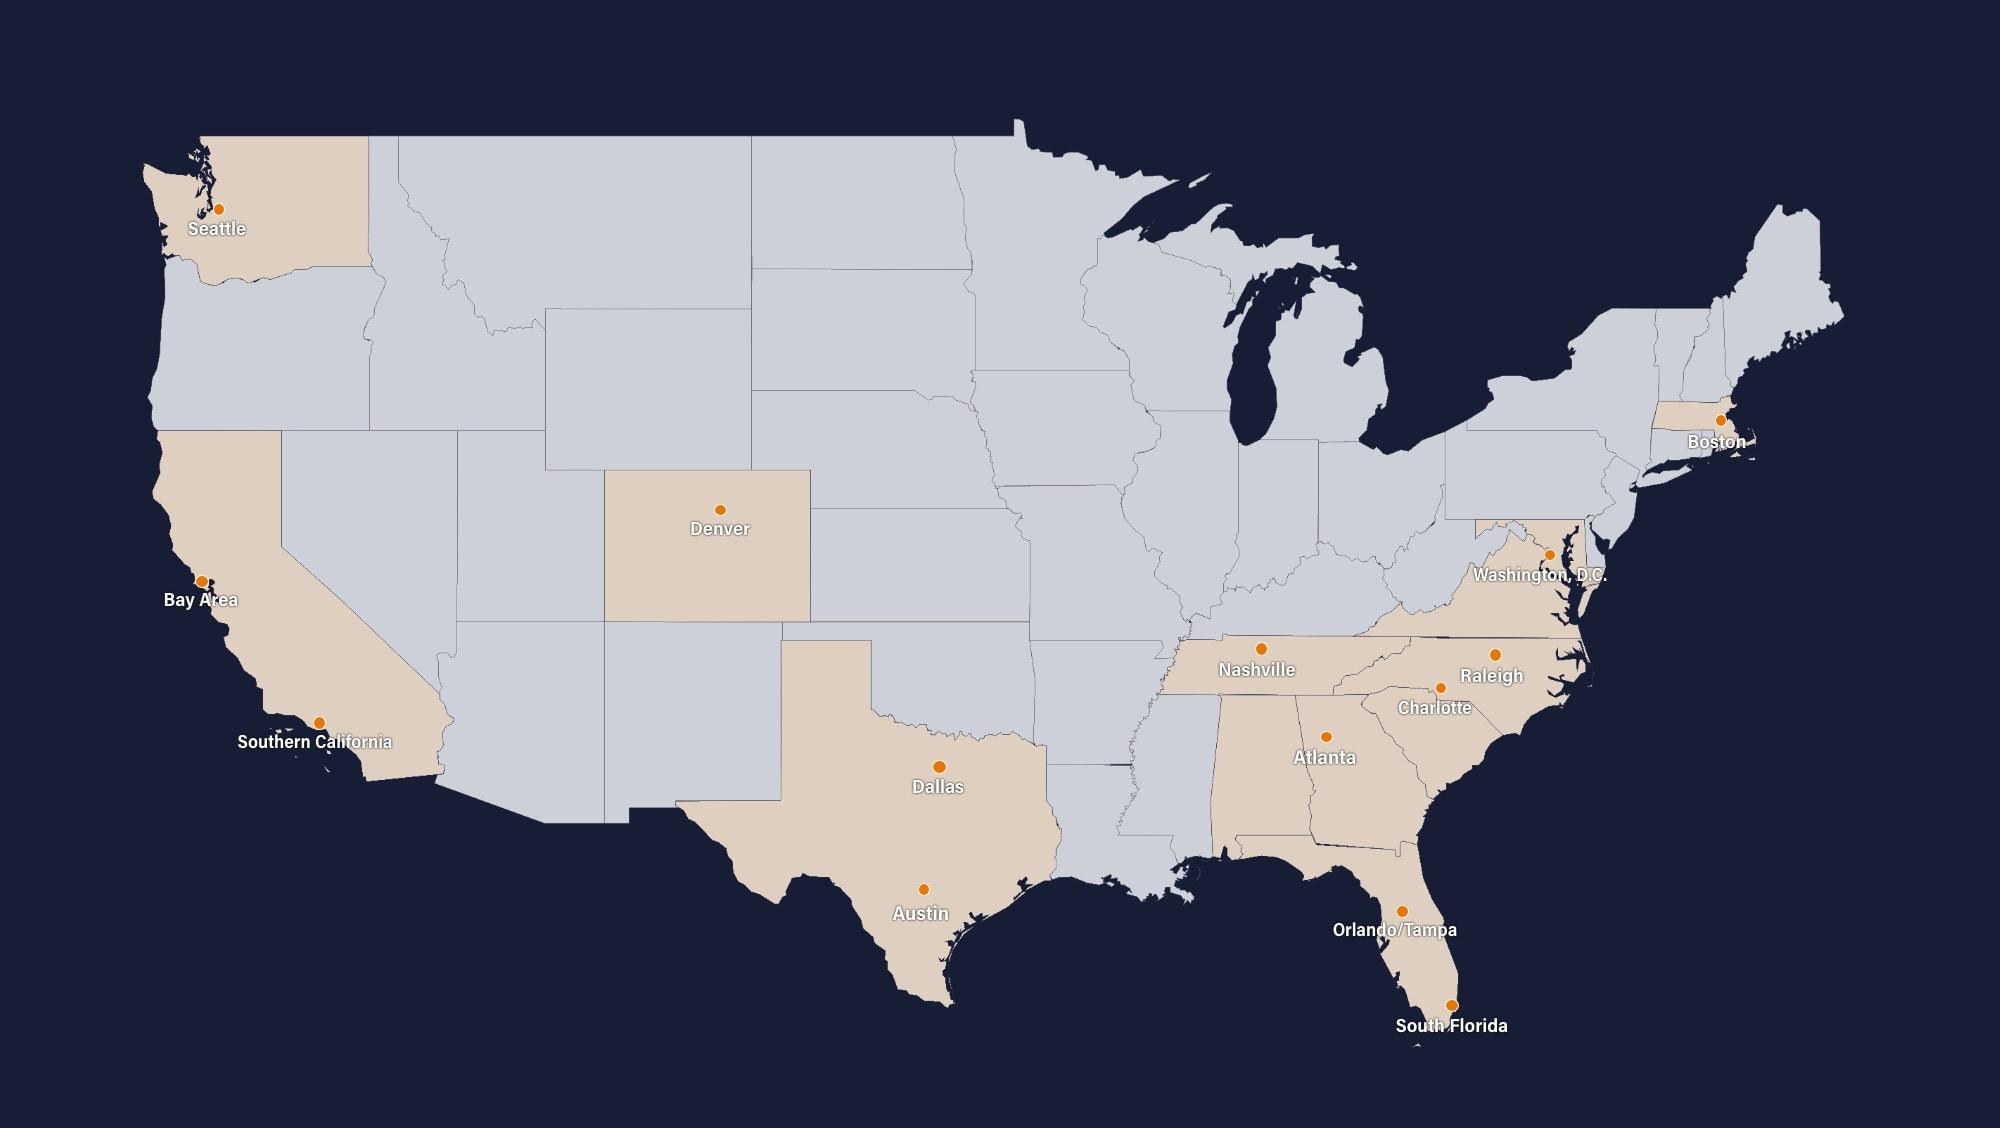 U.S. map depicting various apartment locations